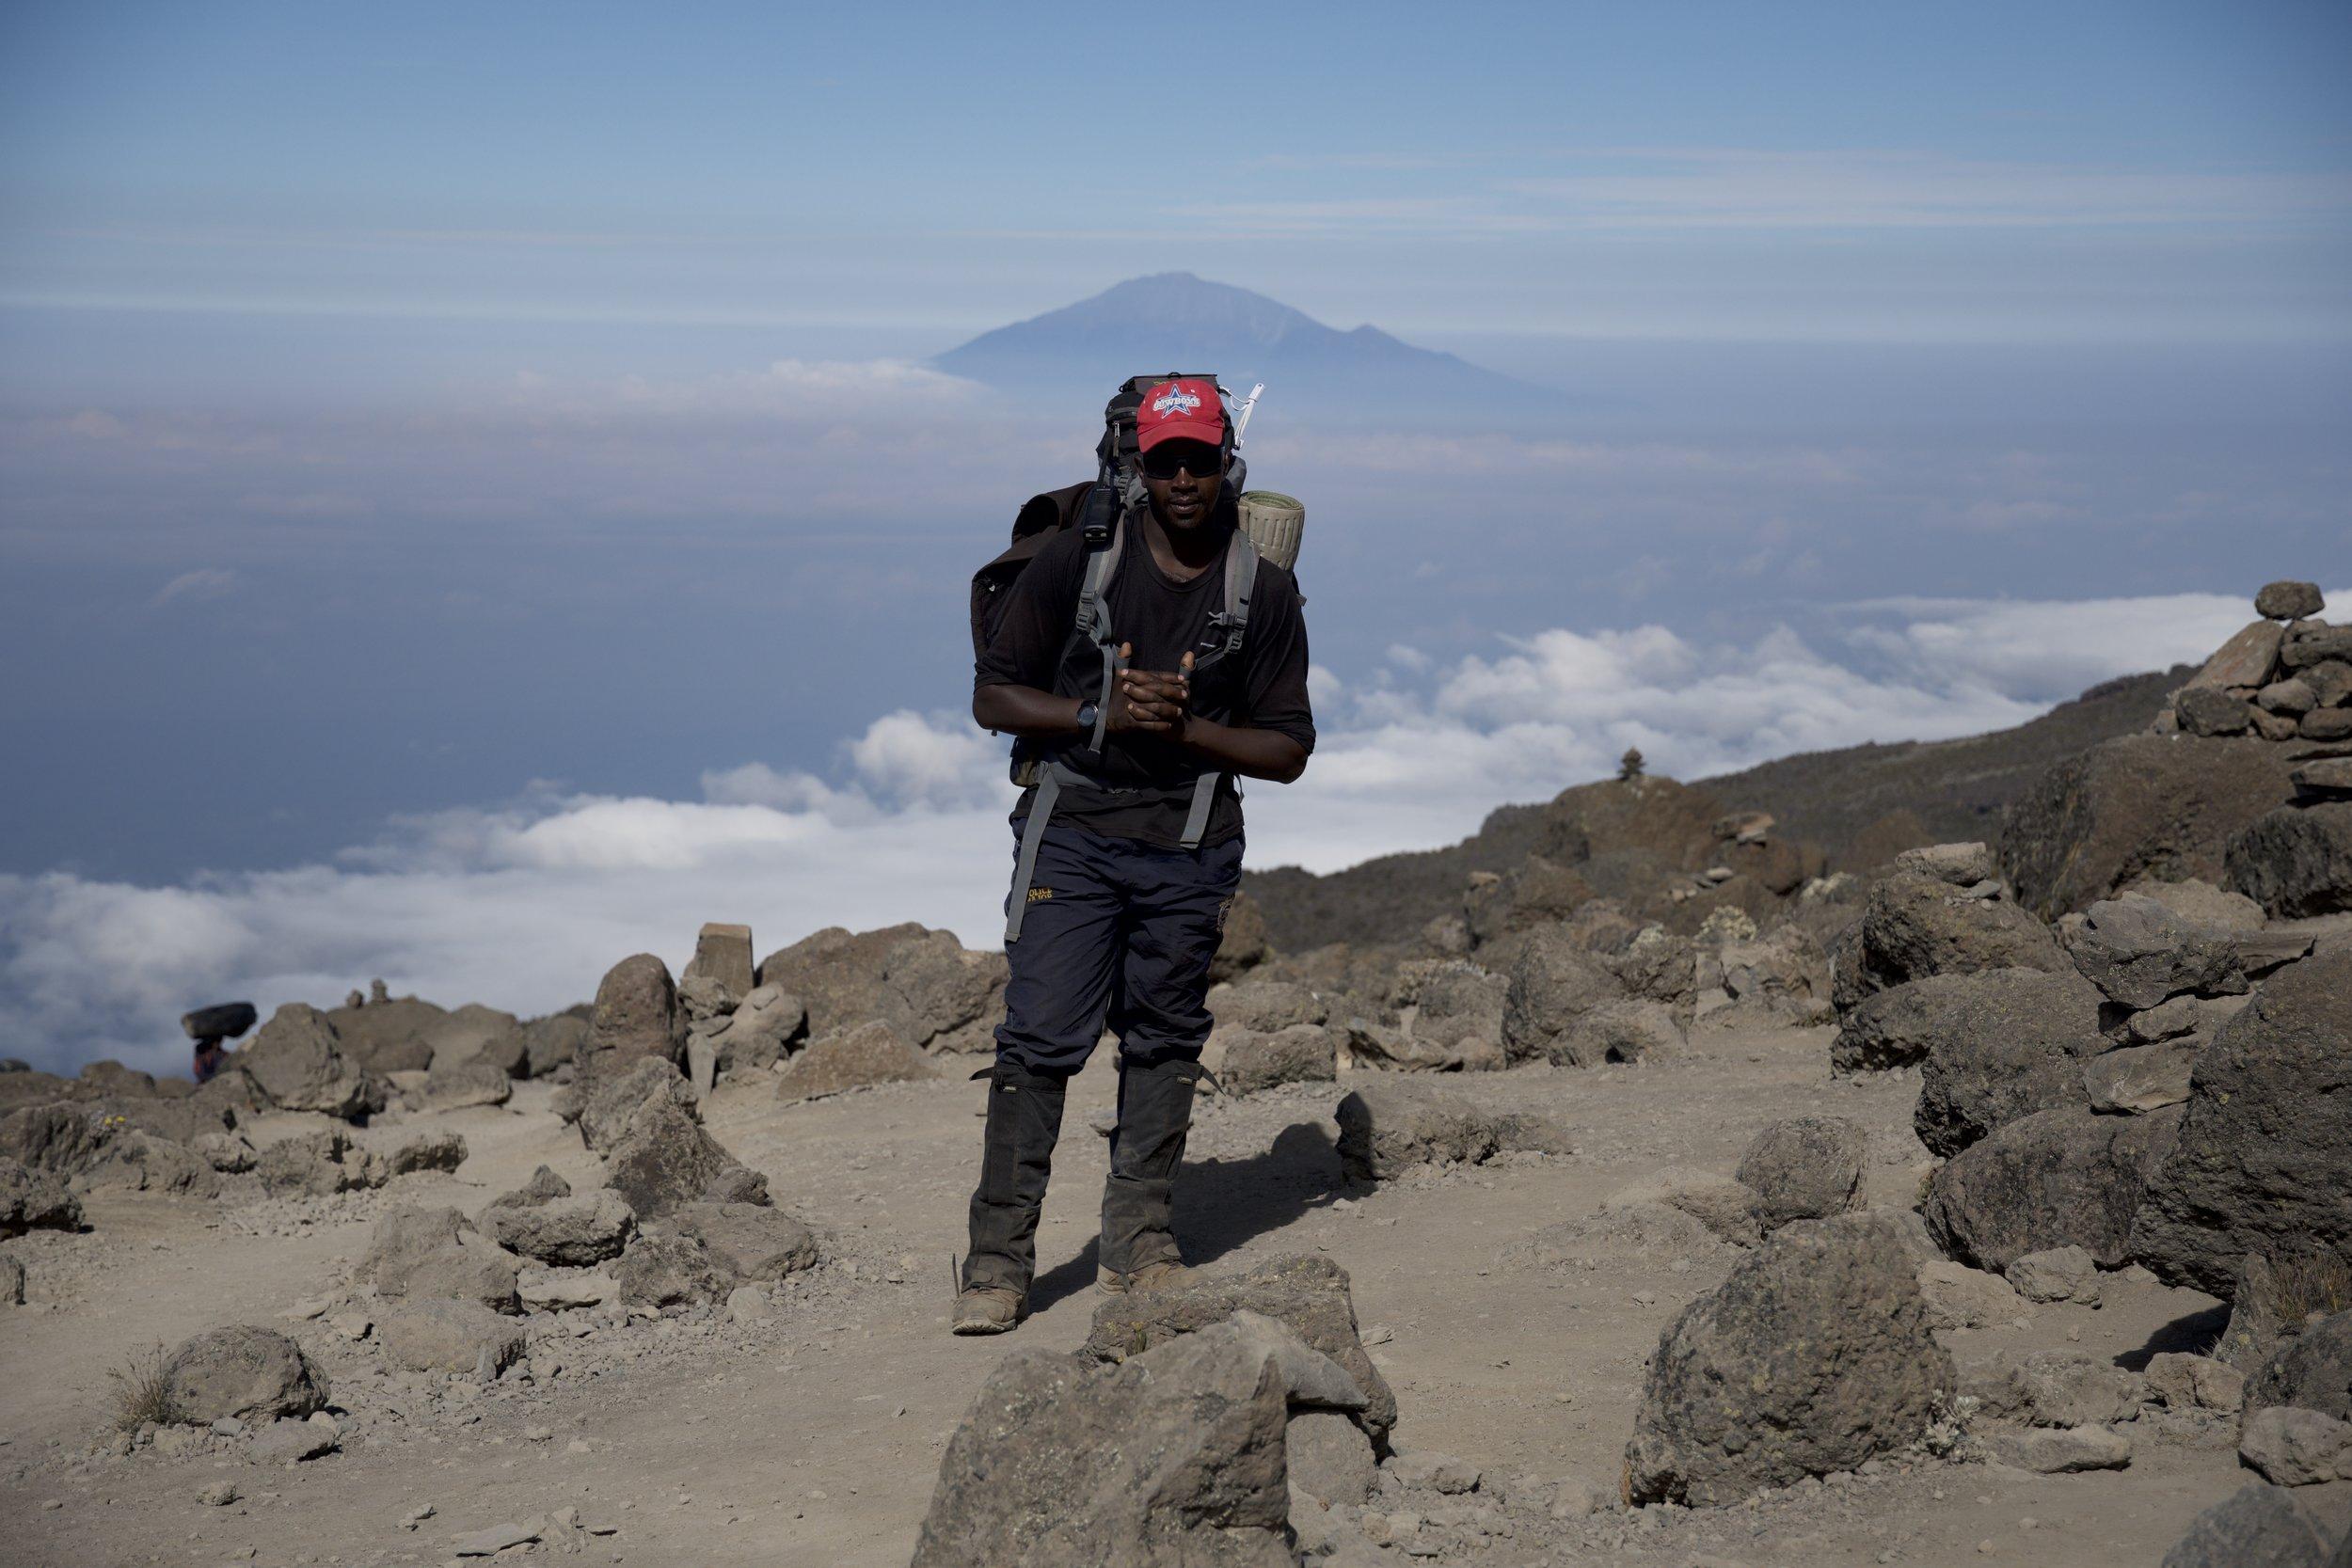 Day 7 / View of Mount Meru